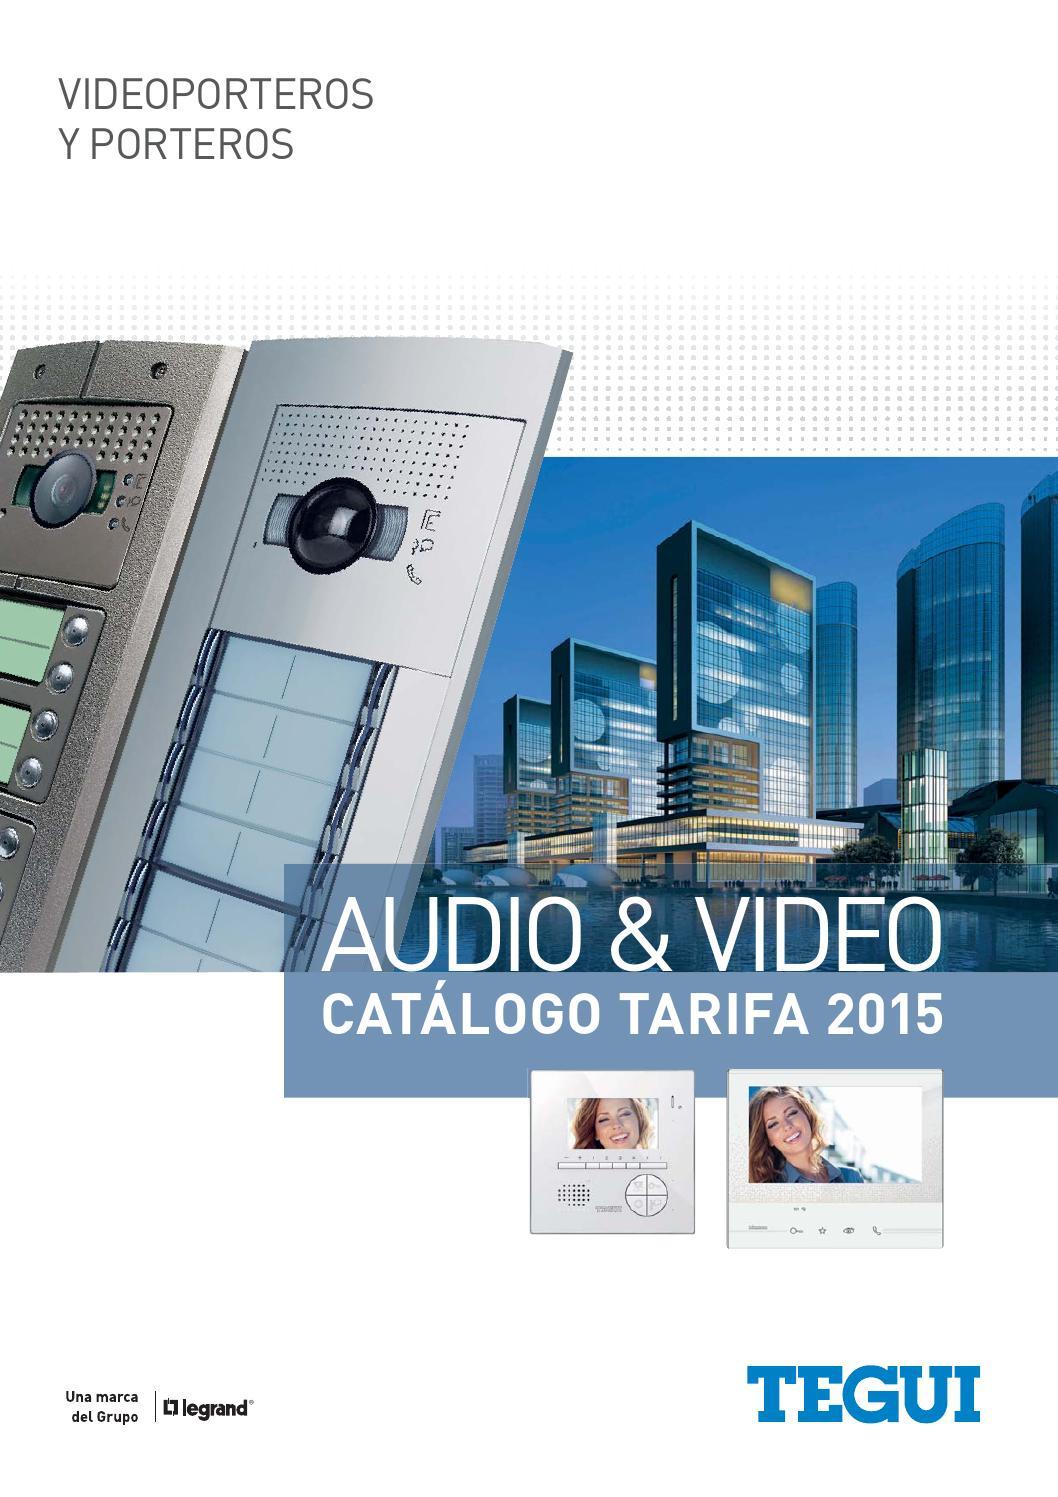 Catalogo Videoporteros Porteros Tegui 2015 By Alejandro